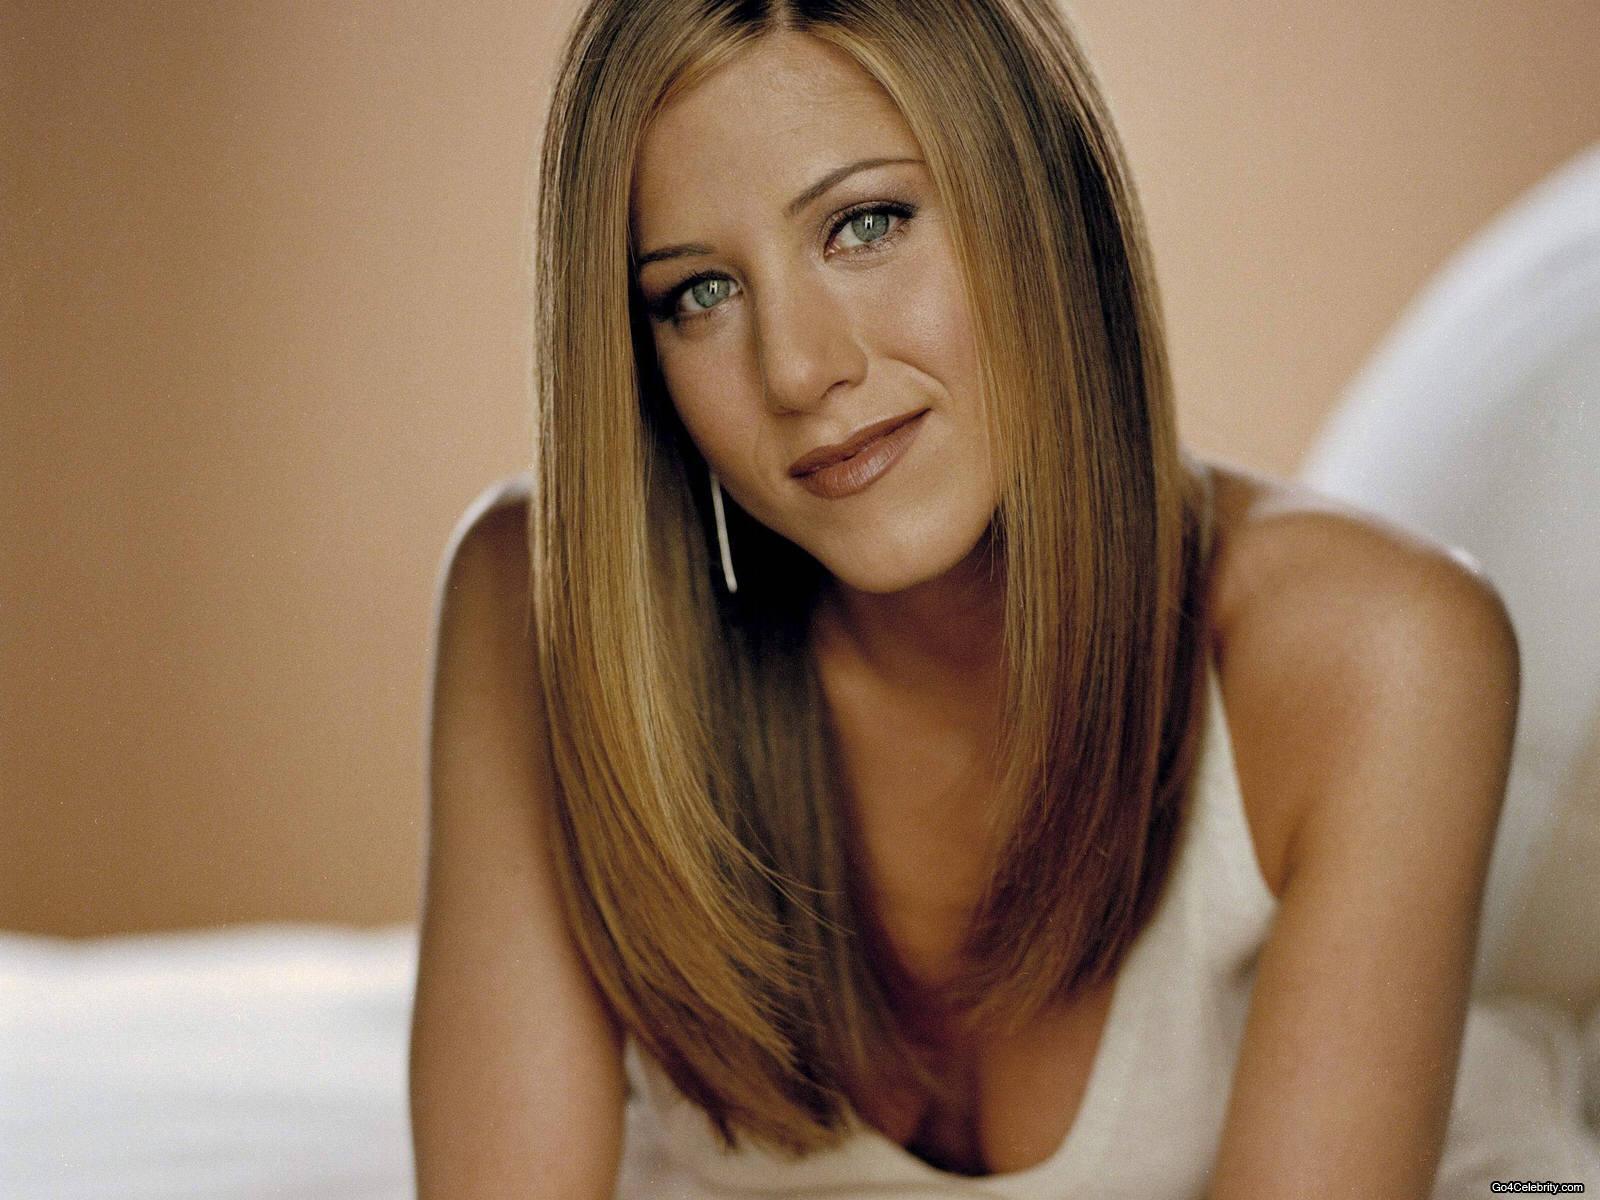 http://4.bp.blogspot.com/_wBdQYYNfKzk/TJcqdBUiBlI/AAAAAAAAAcw/G8dNfLlqkJo/s1600/Jennifer-Aniston-042.jpg